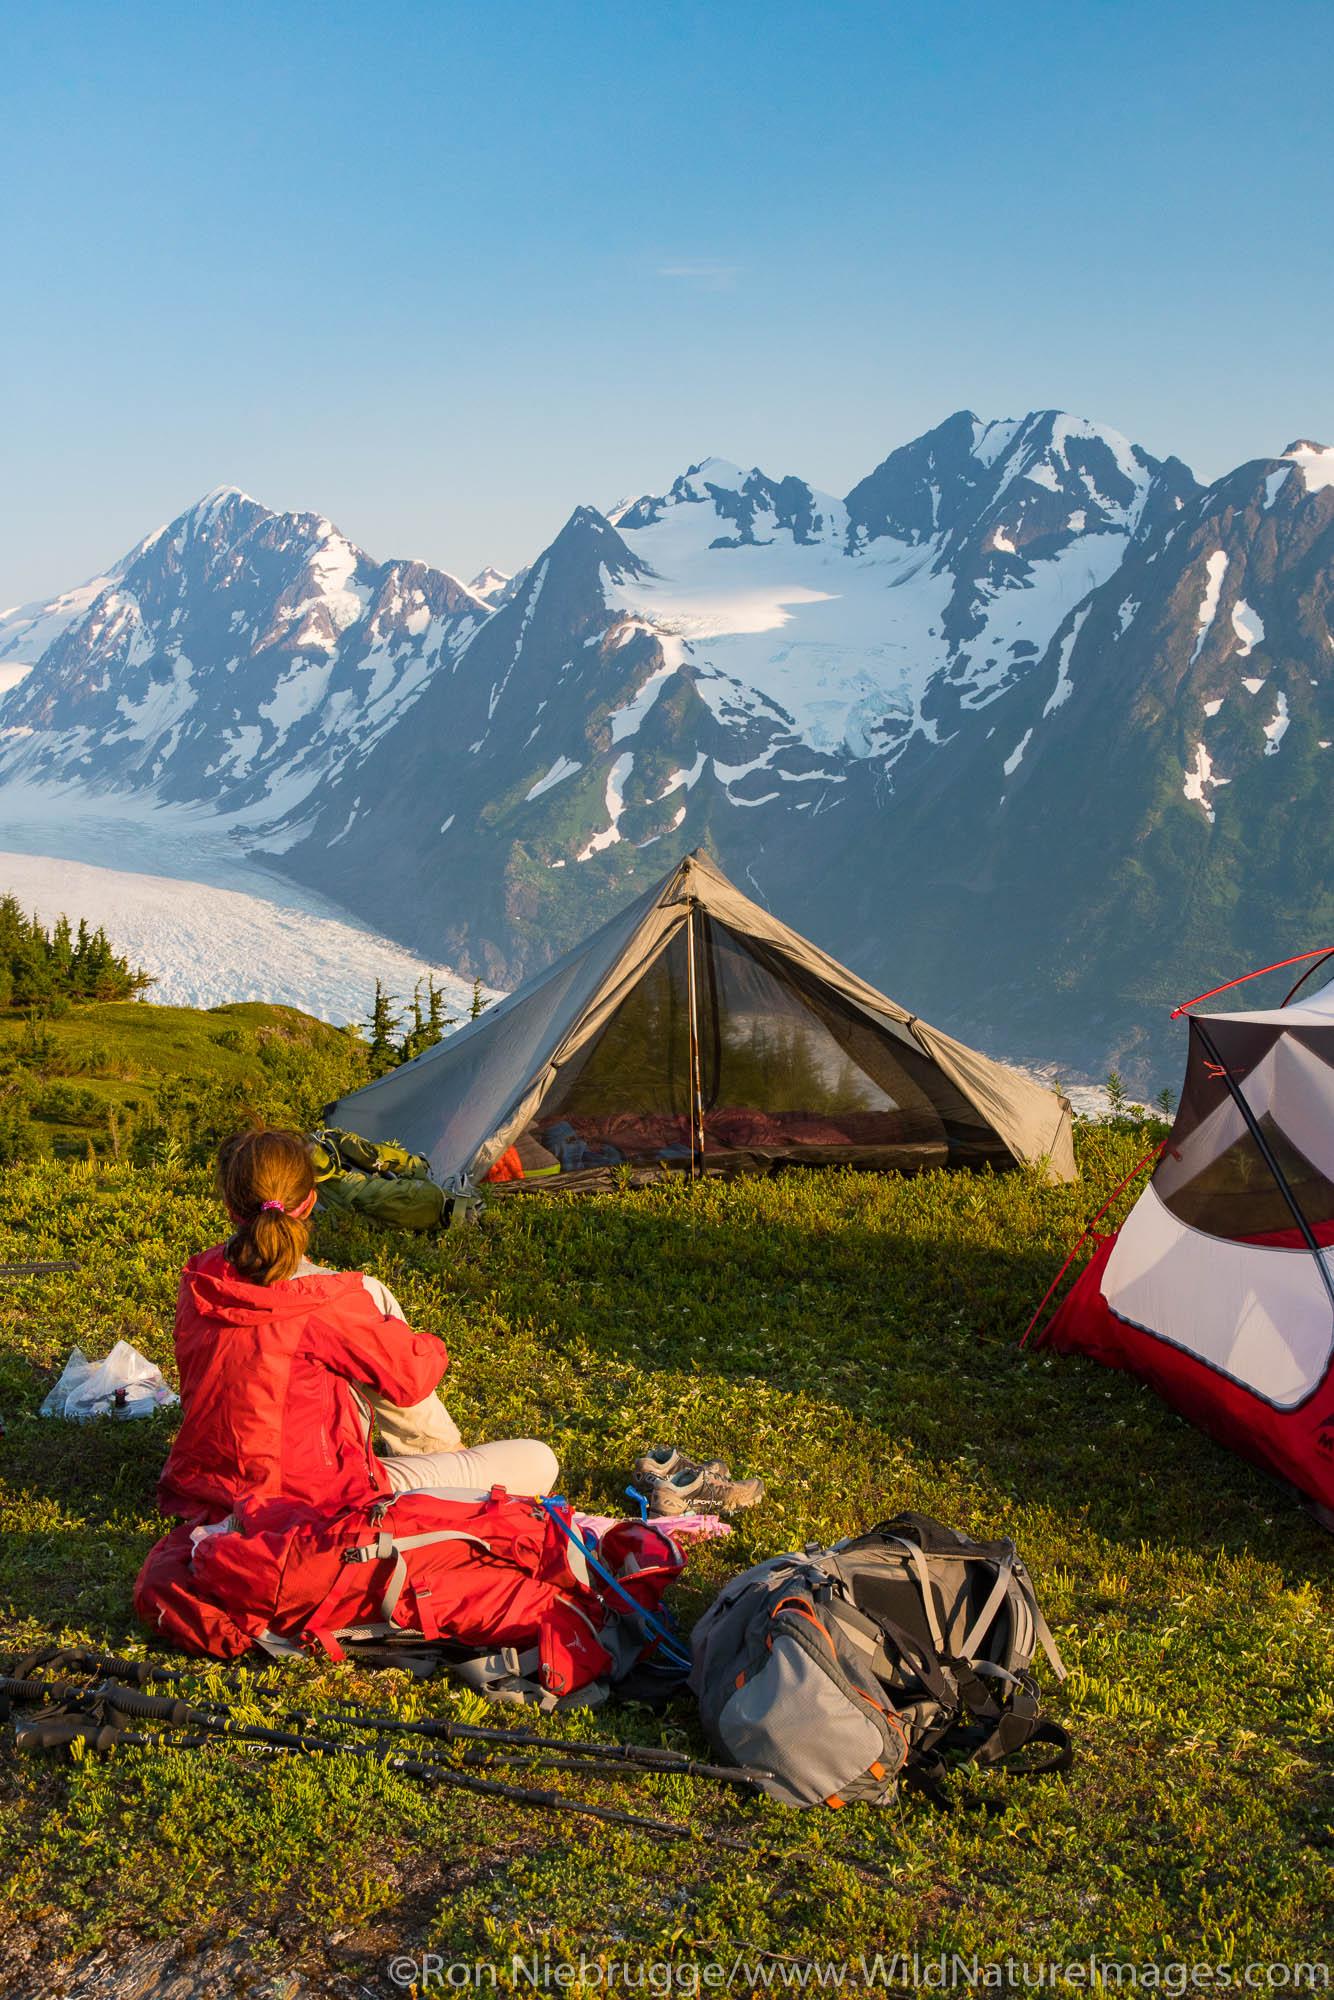 Backpacking to the Spencer Glacier Bench, Chugach National Forest, Alaska.